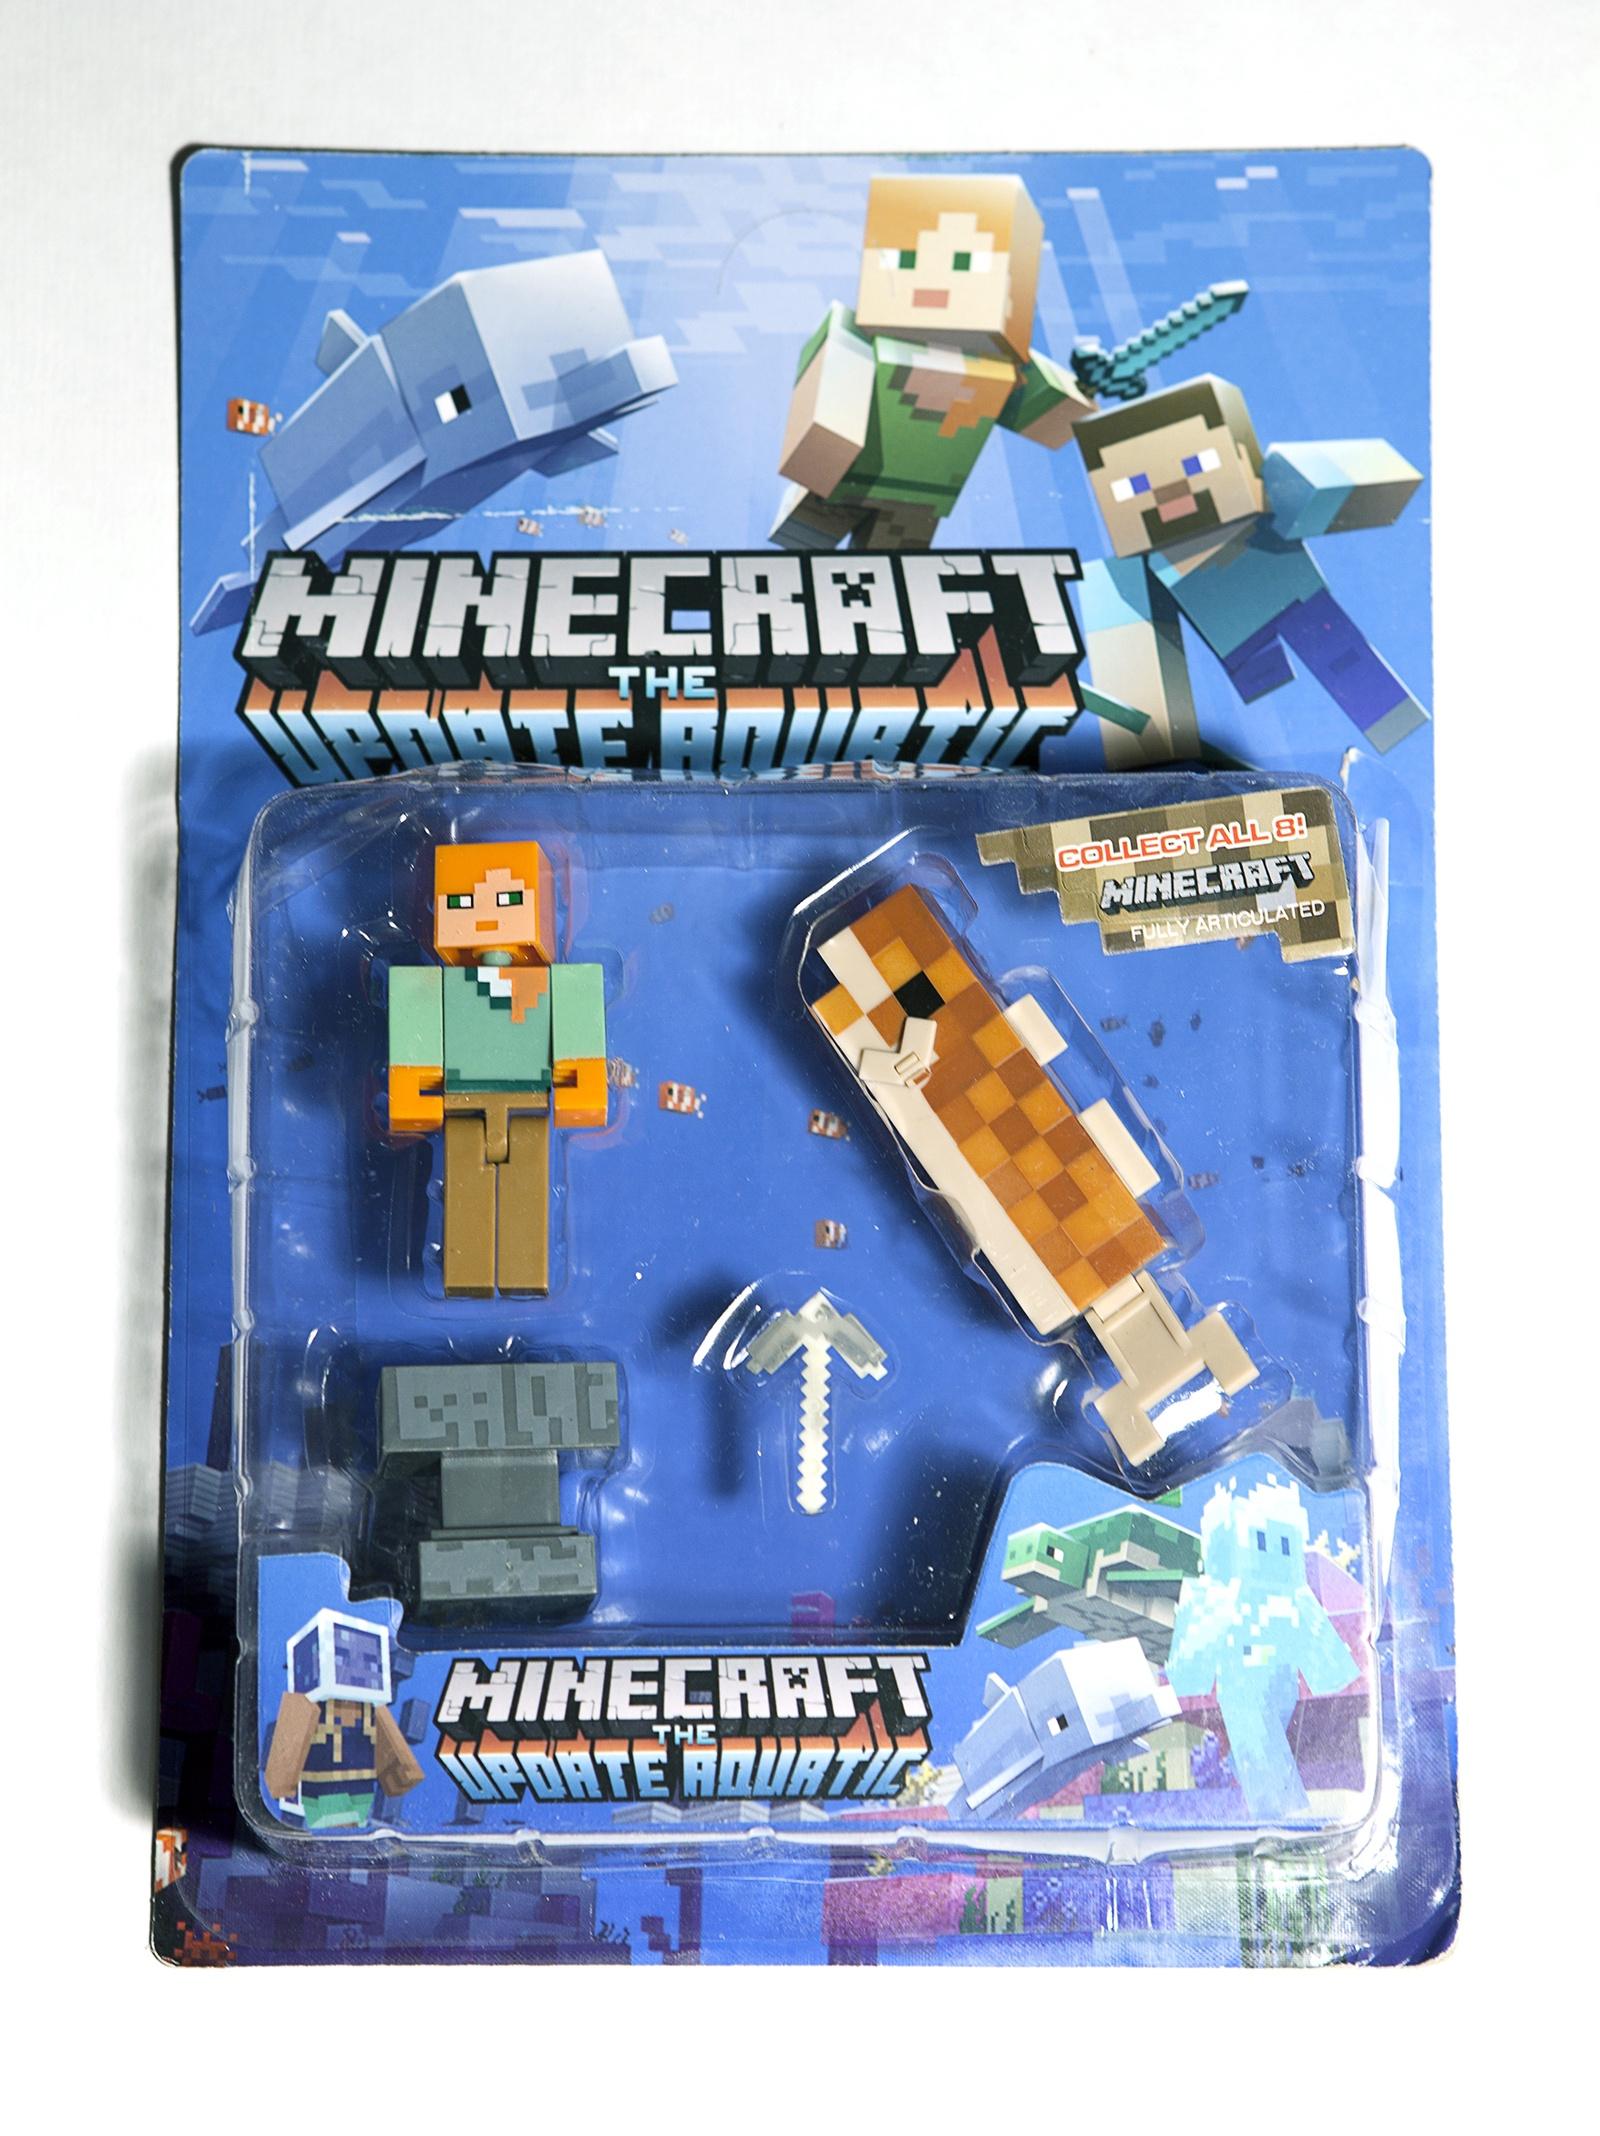 Набор фигурок Minecraft The Update Aquatic small: Pack 6 игровые фигурки 1 toy набор фигурок крысы 6 шт